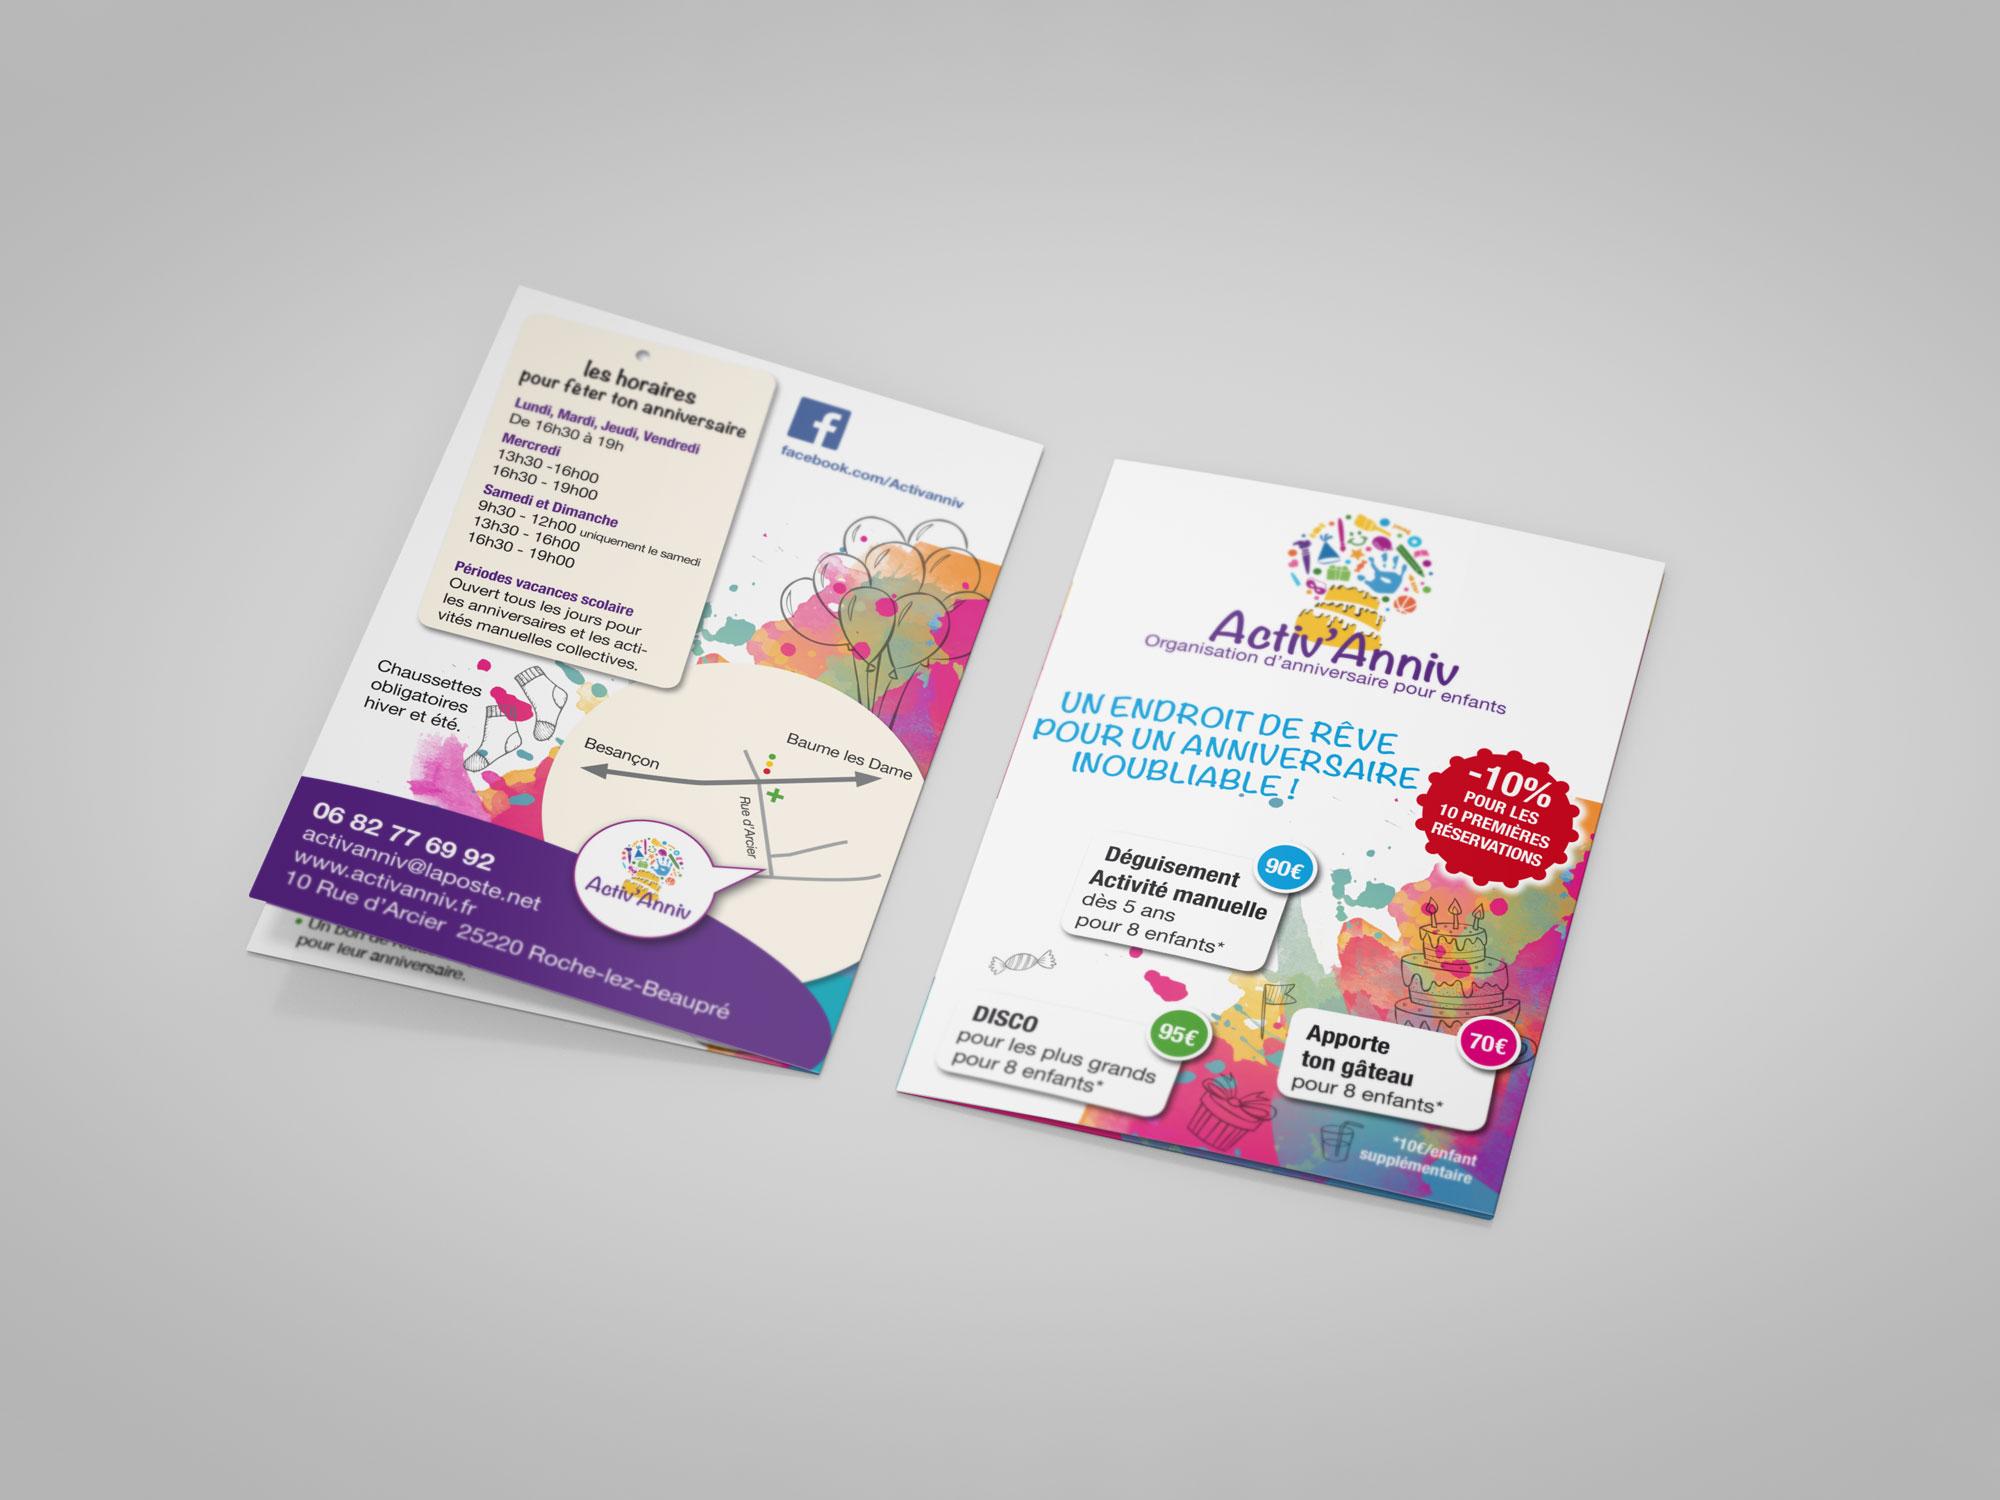 Leaflet Activ'anniv